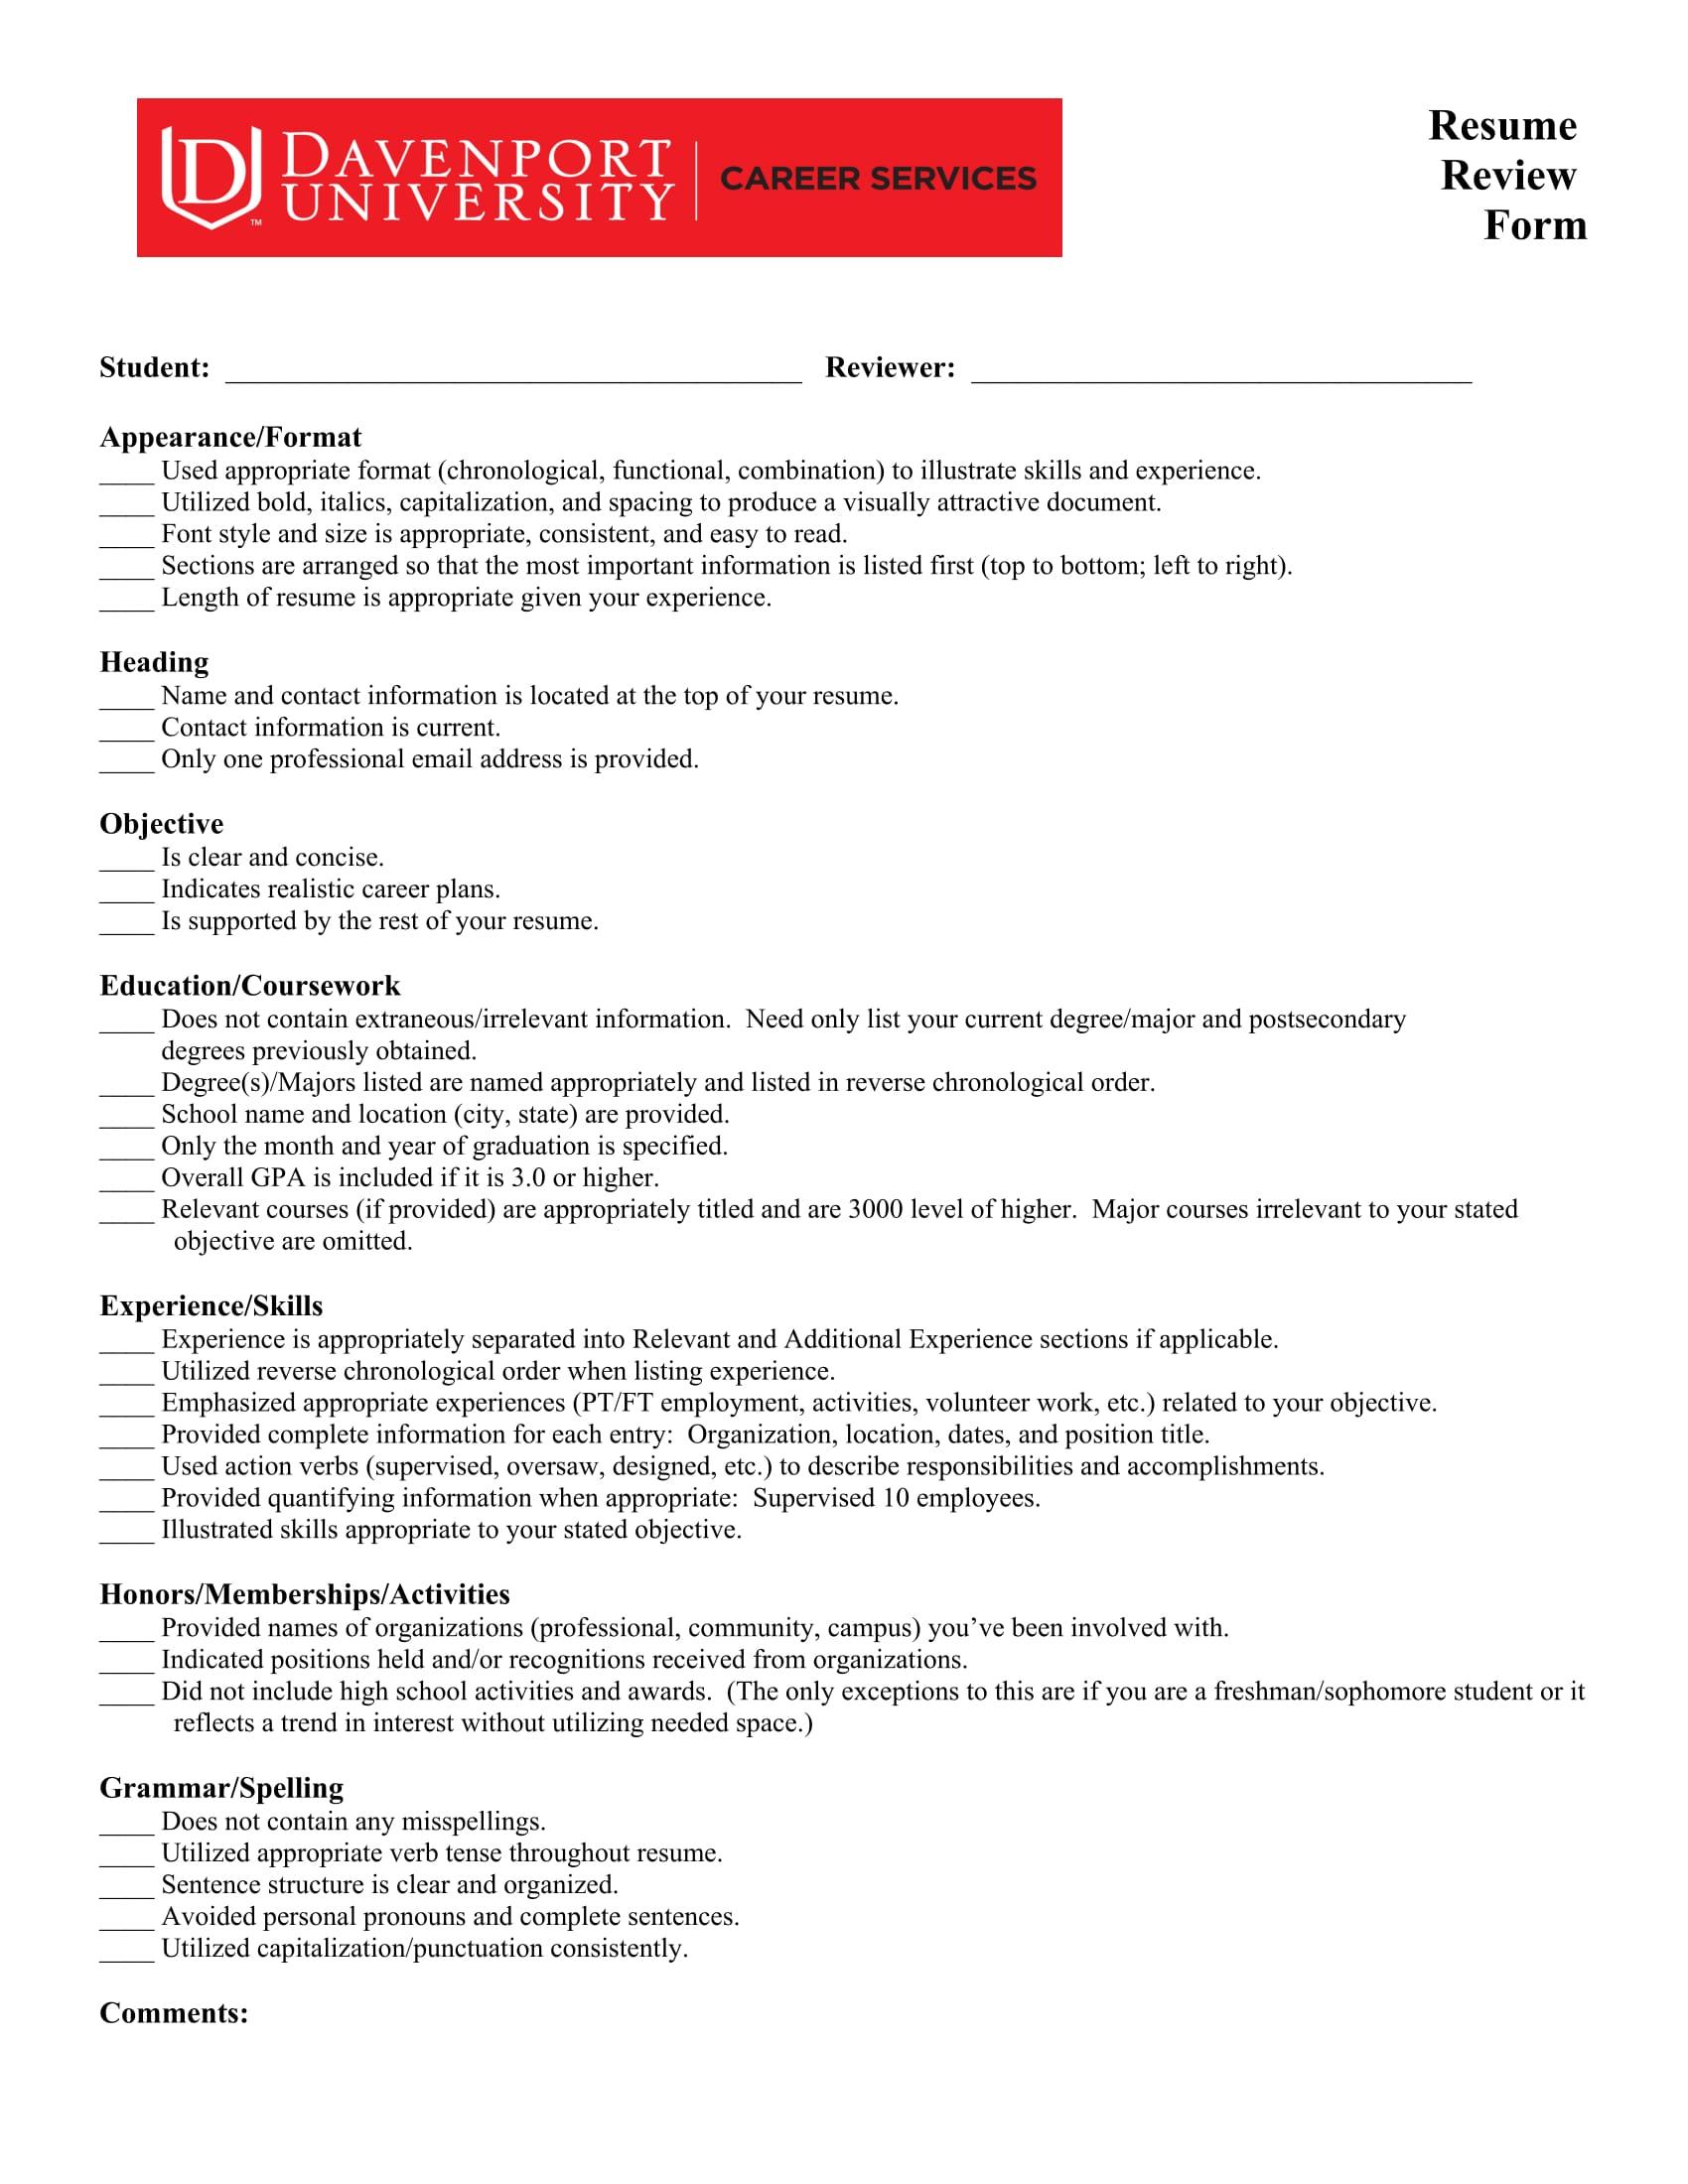 Pretty Employer Resume Checklist Photos - Entry Level Resume ...